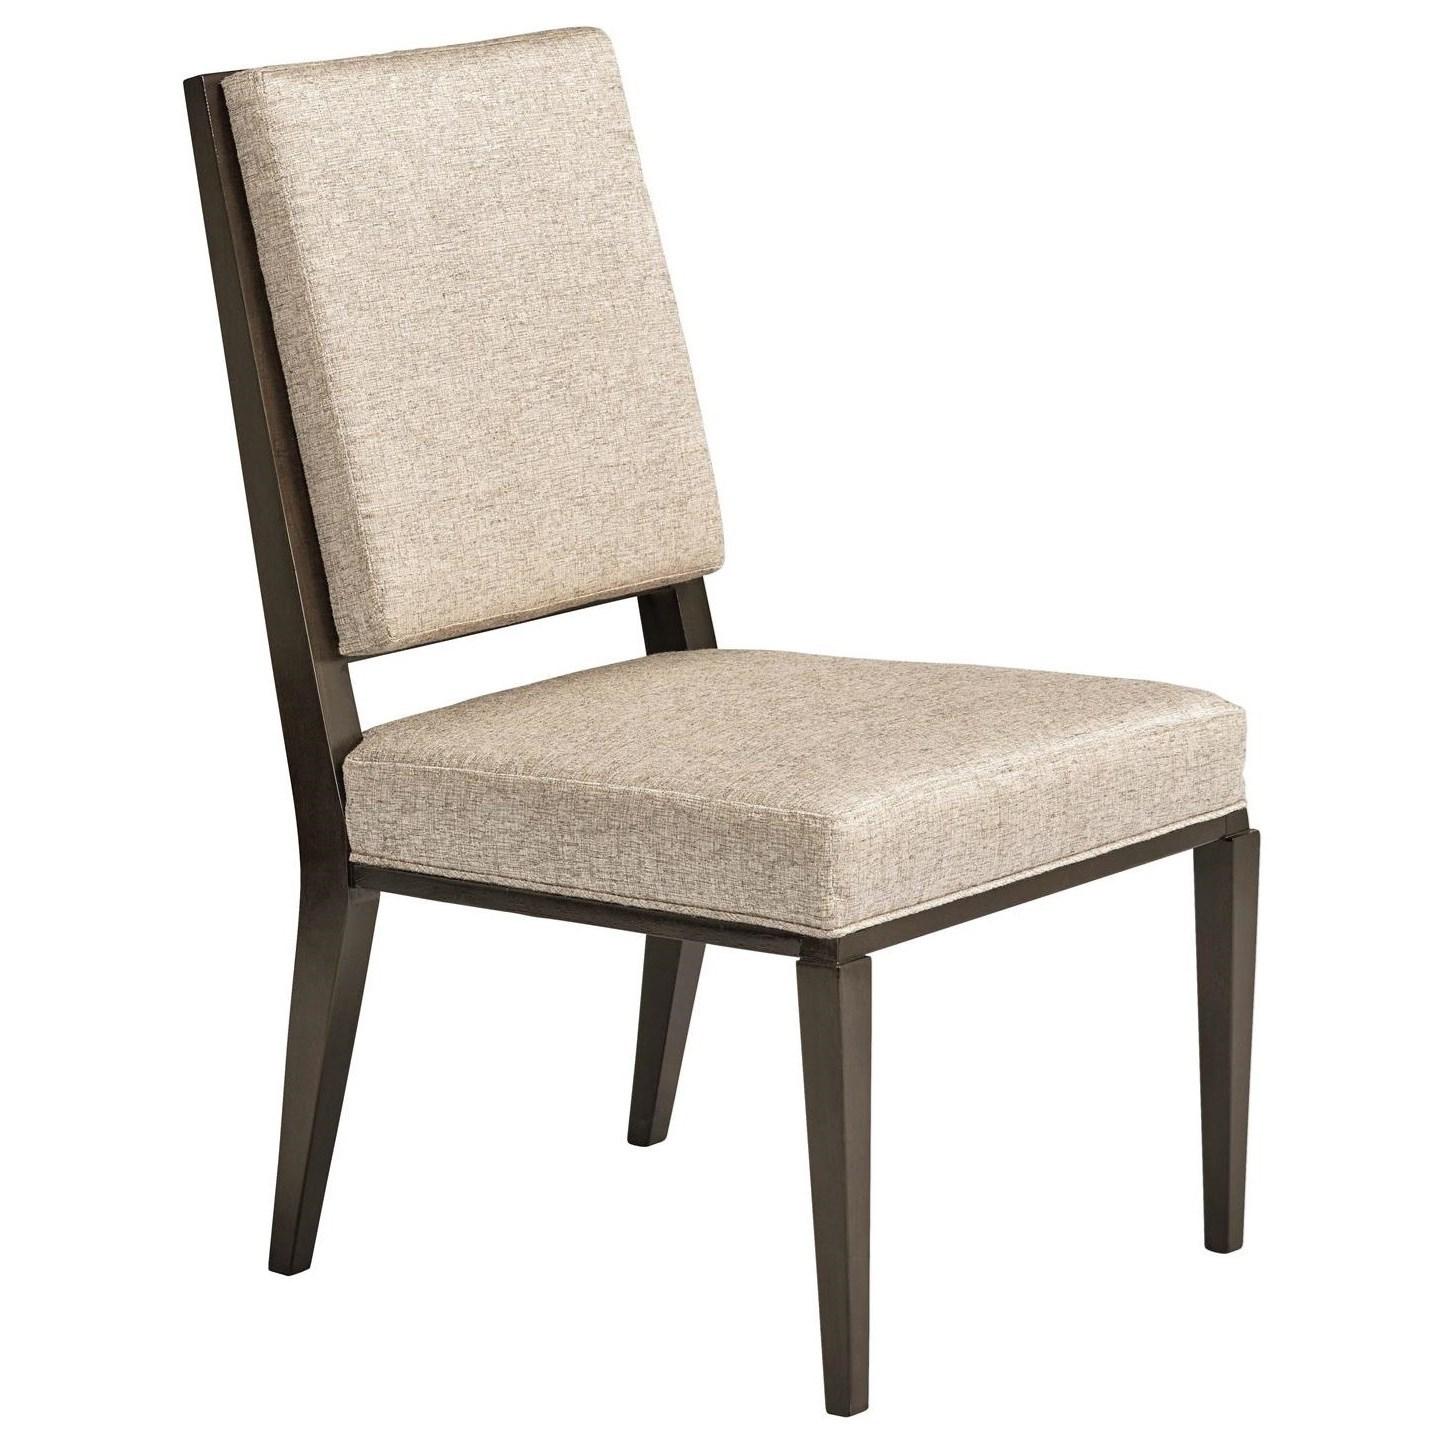 Fine Furniture Design Deco Spirales Side Dining Chair - Item Number: 1680-820